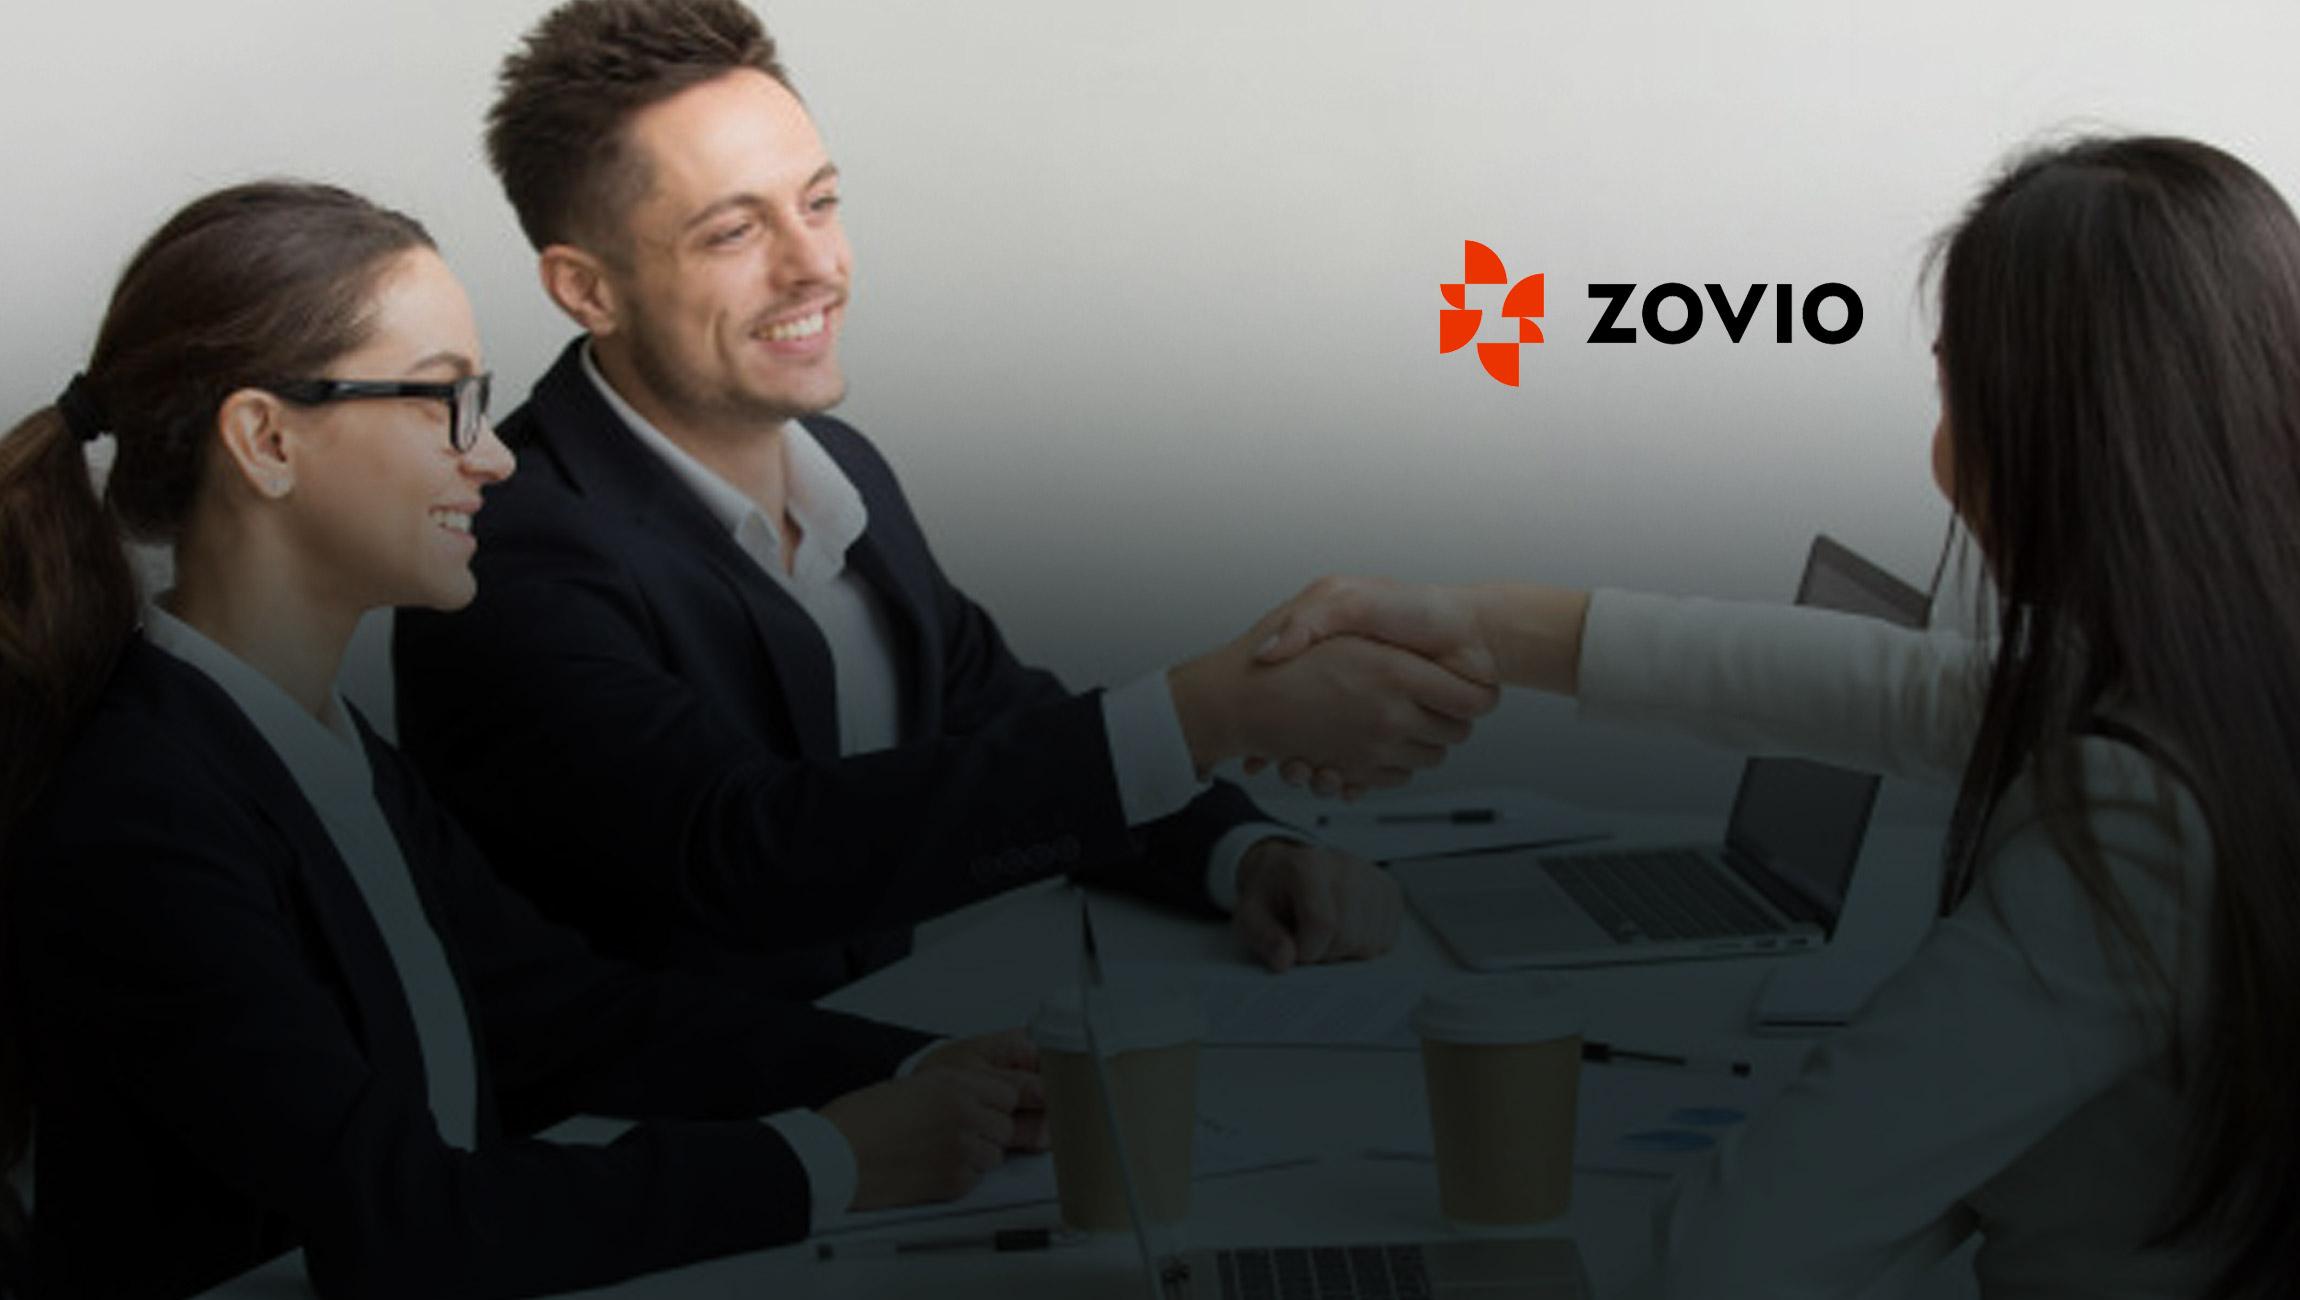 Zovio Announces Agreement with SevenSaoi Capital